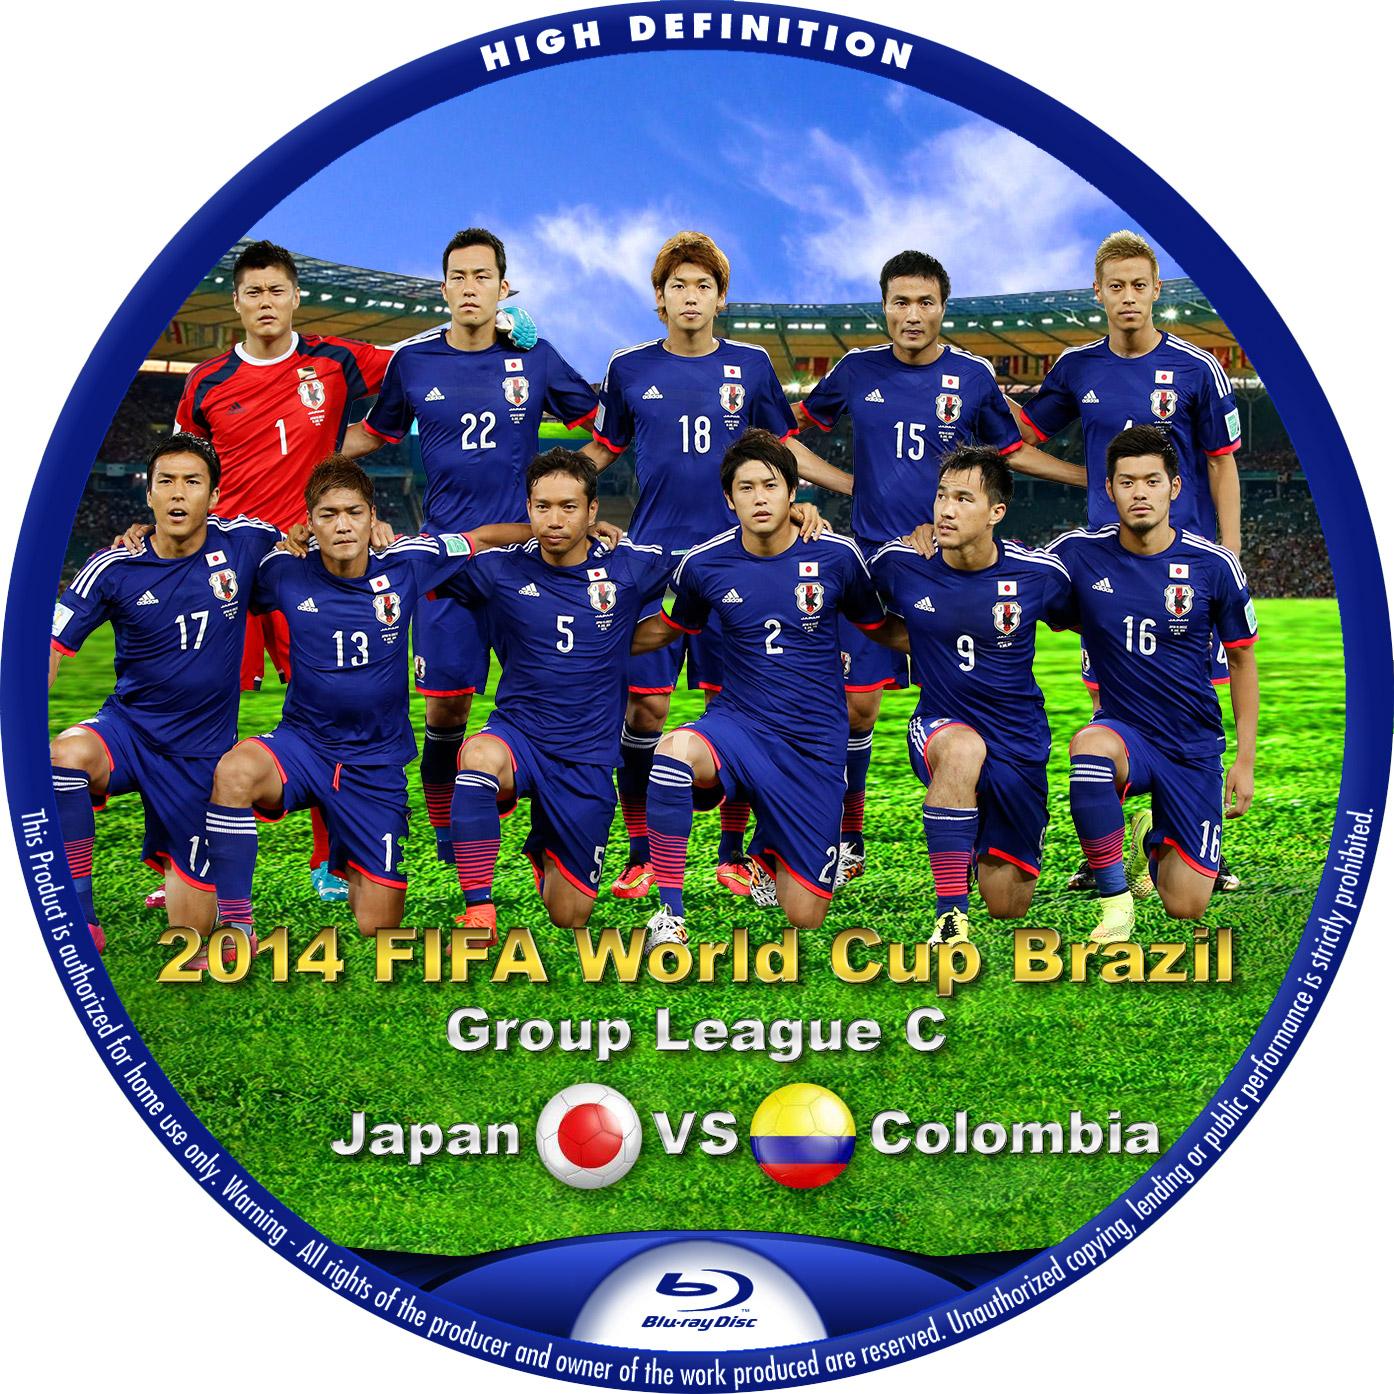 W杯 2014 ブラジル 日本代表 コロンビア BDラベル Blu-ray